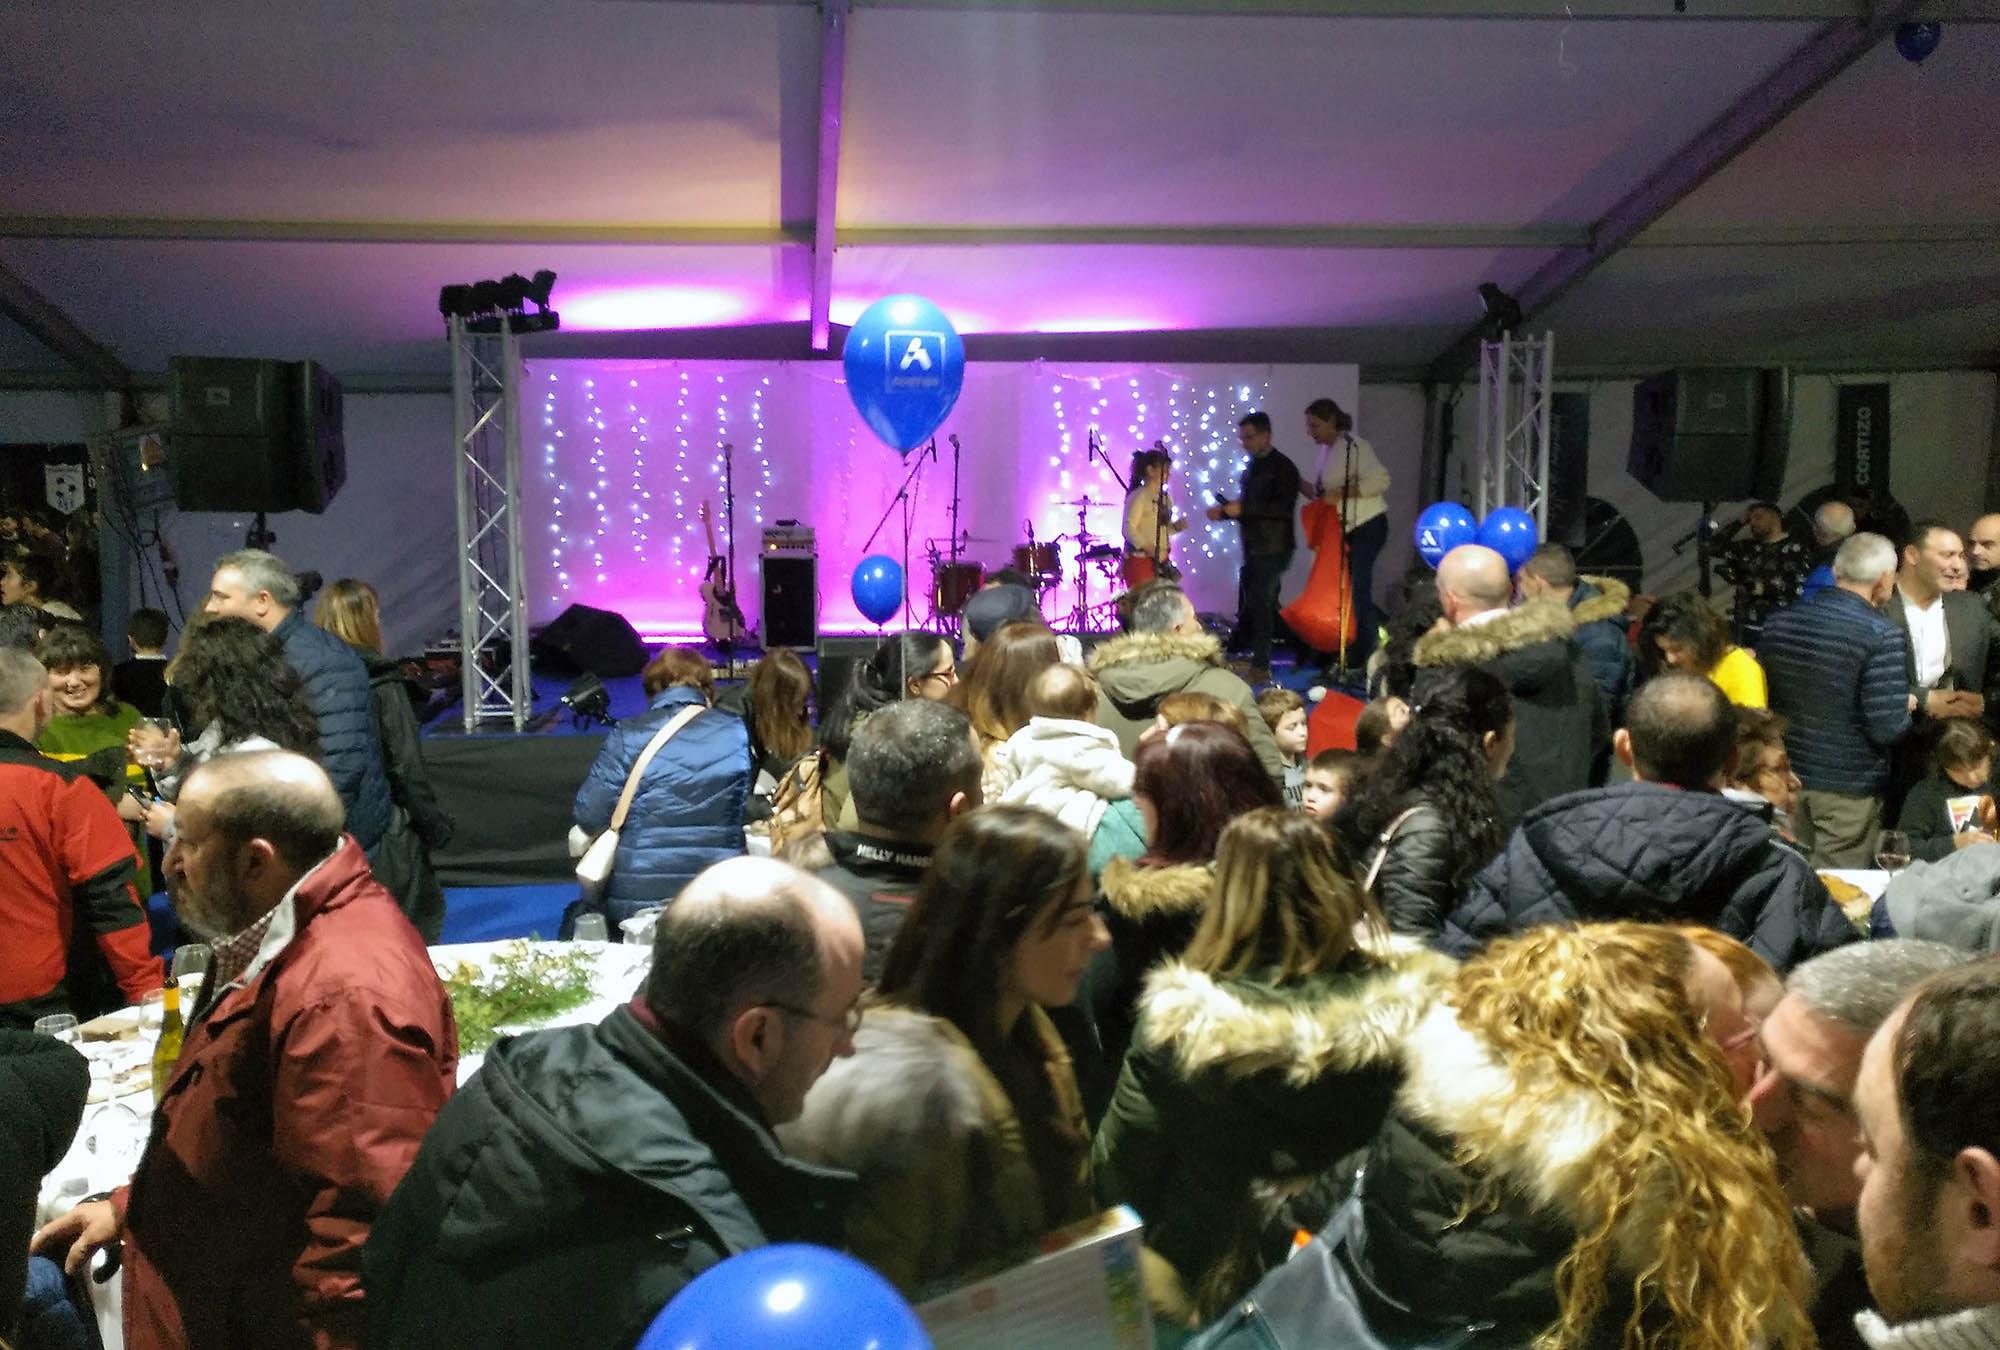 Eventos Sonido Luces Concierto Vigo Pontevedra Galicia